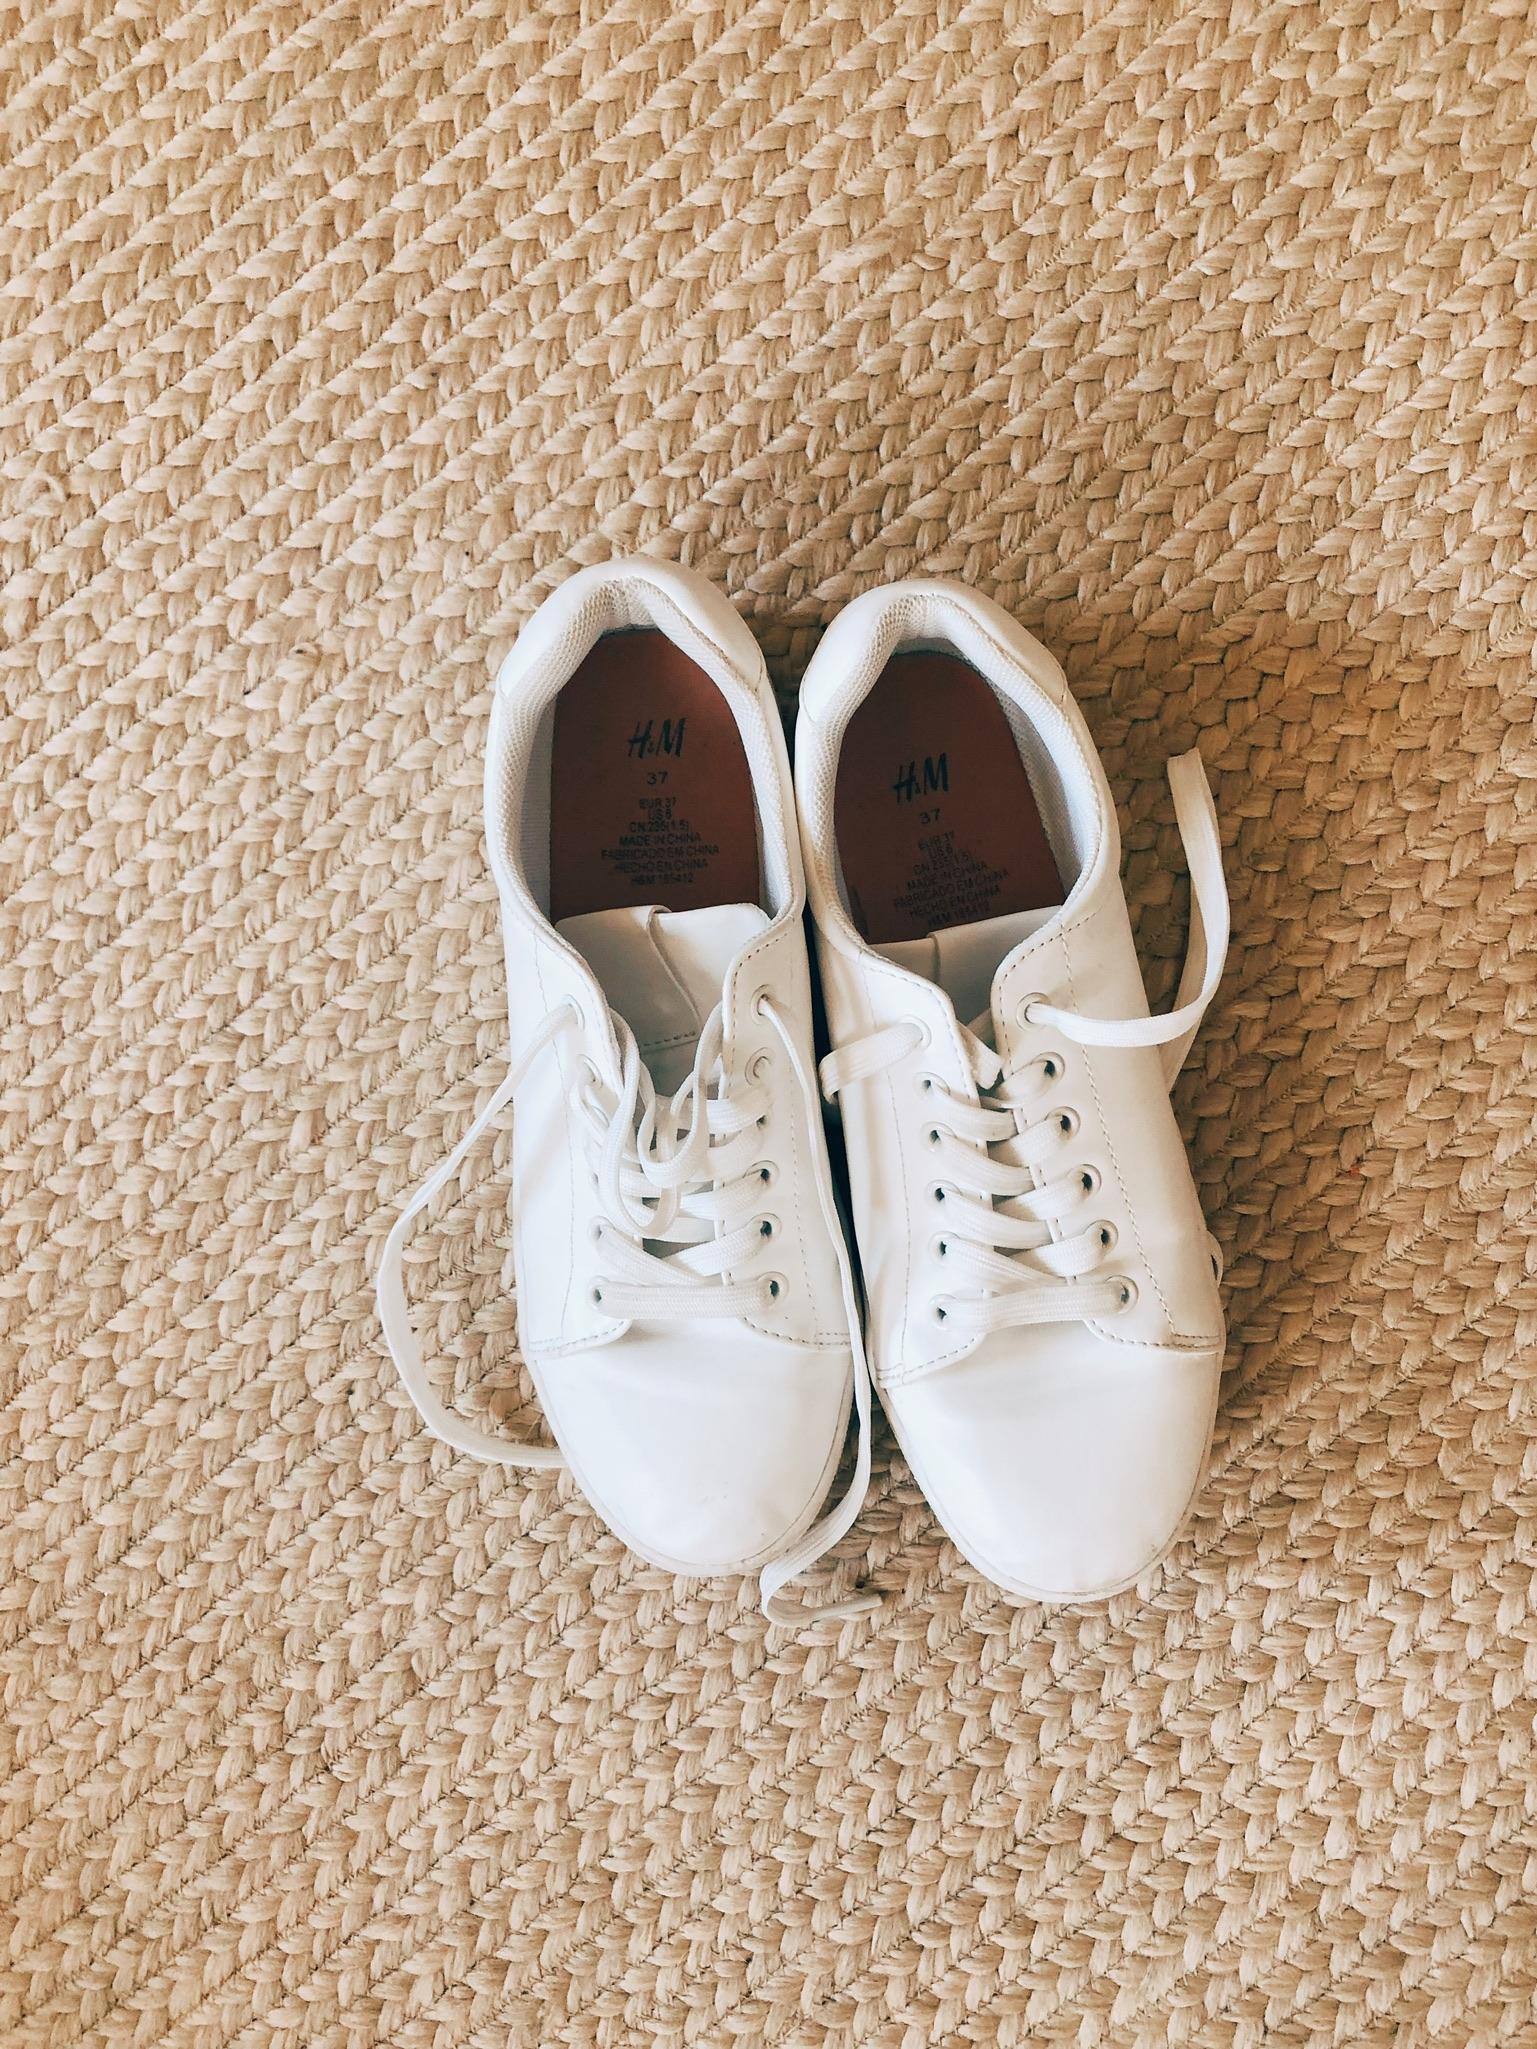 Vintage white platform sneakers, thrift shopping haul, thrift shopping tips